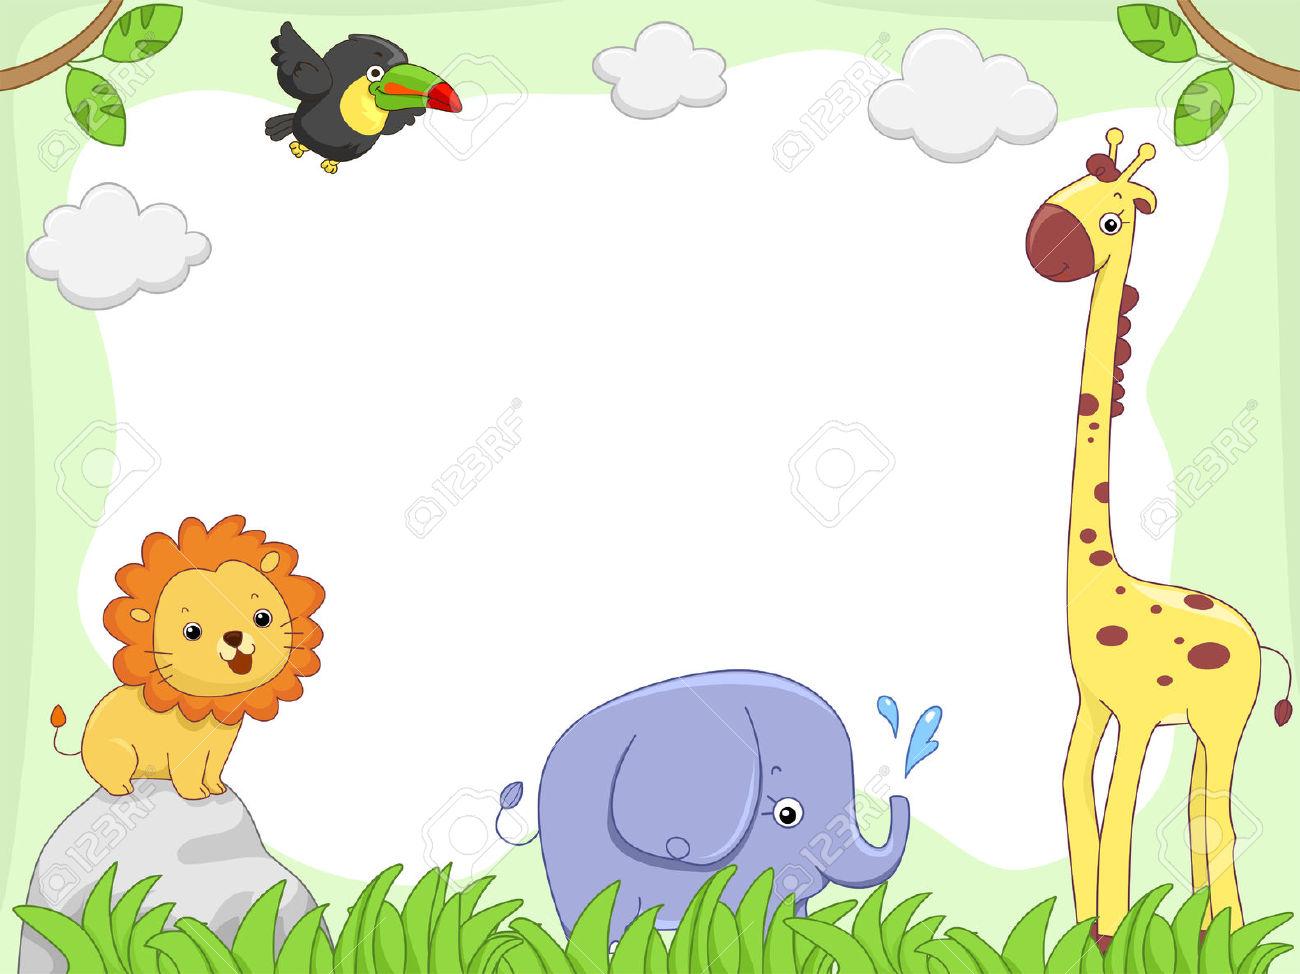 jungle animal clipart borders - Clipground